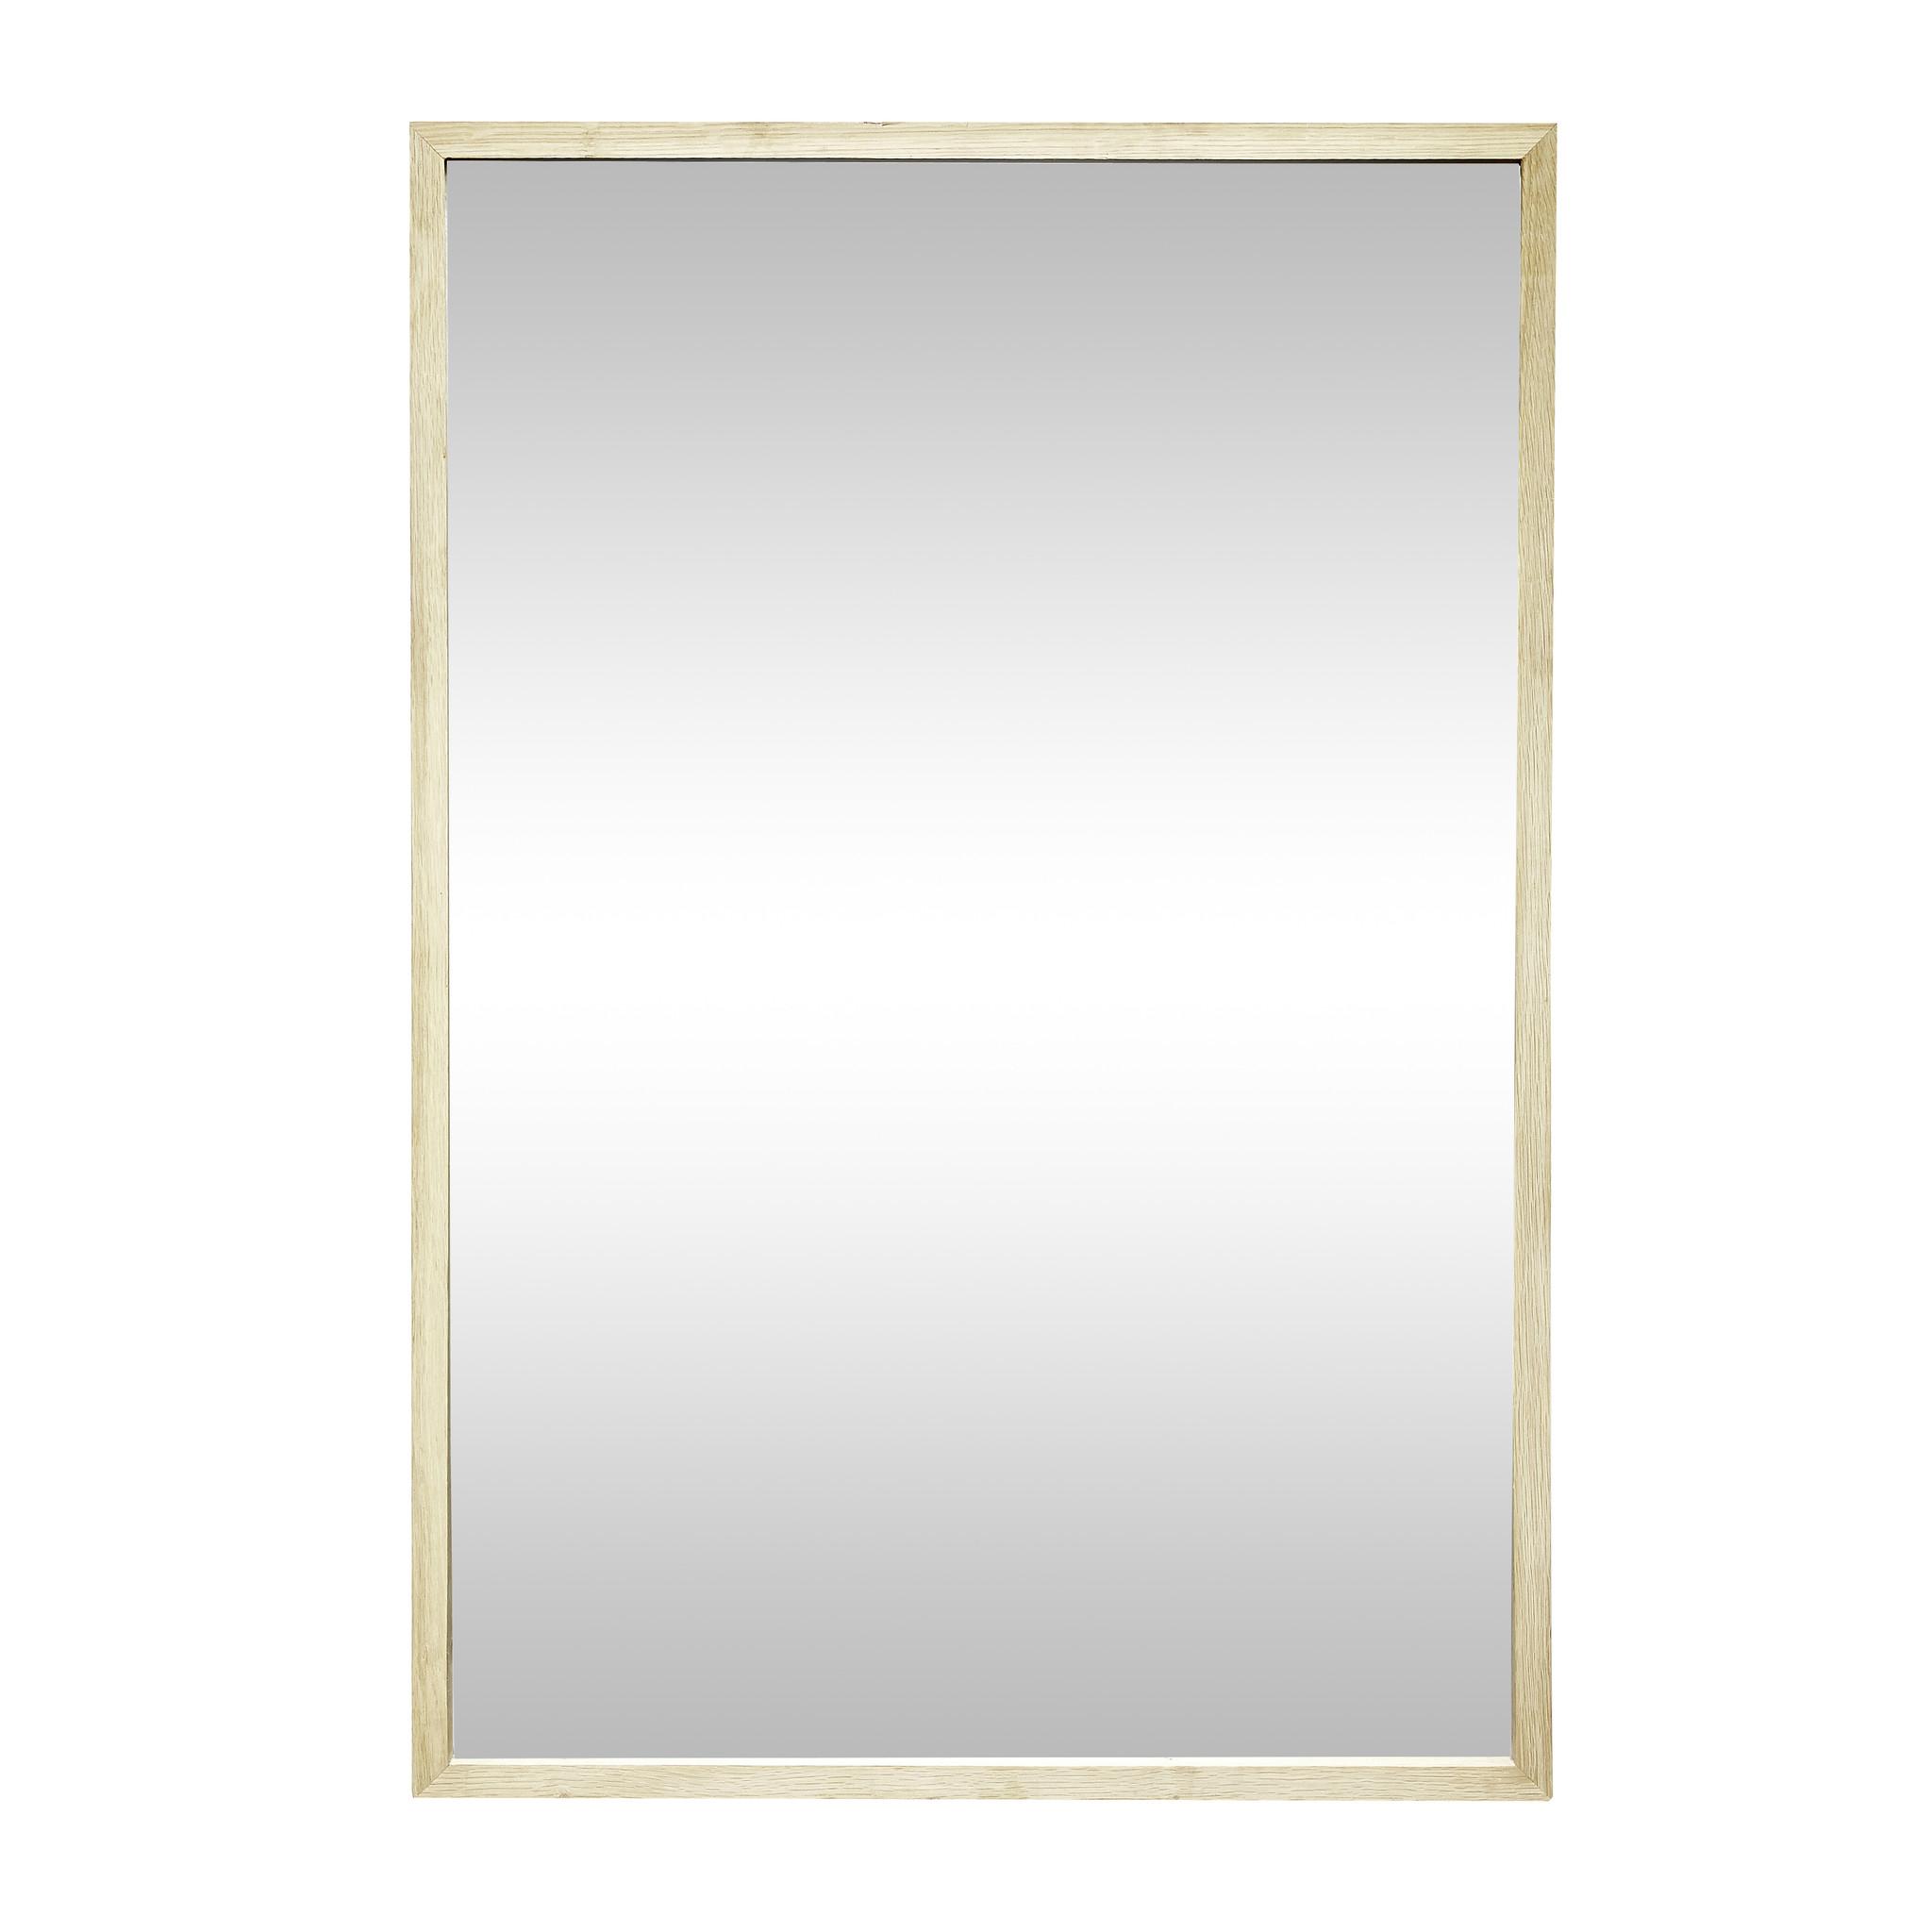 Hubsch Wandspiegel, eik, natuur, medium-889044-5712772041369